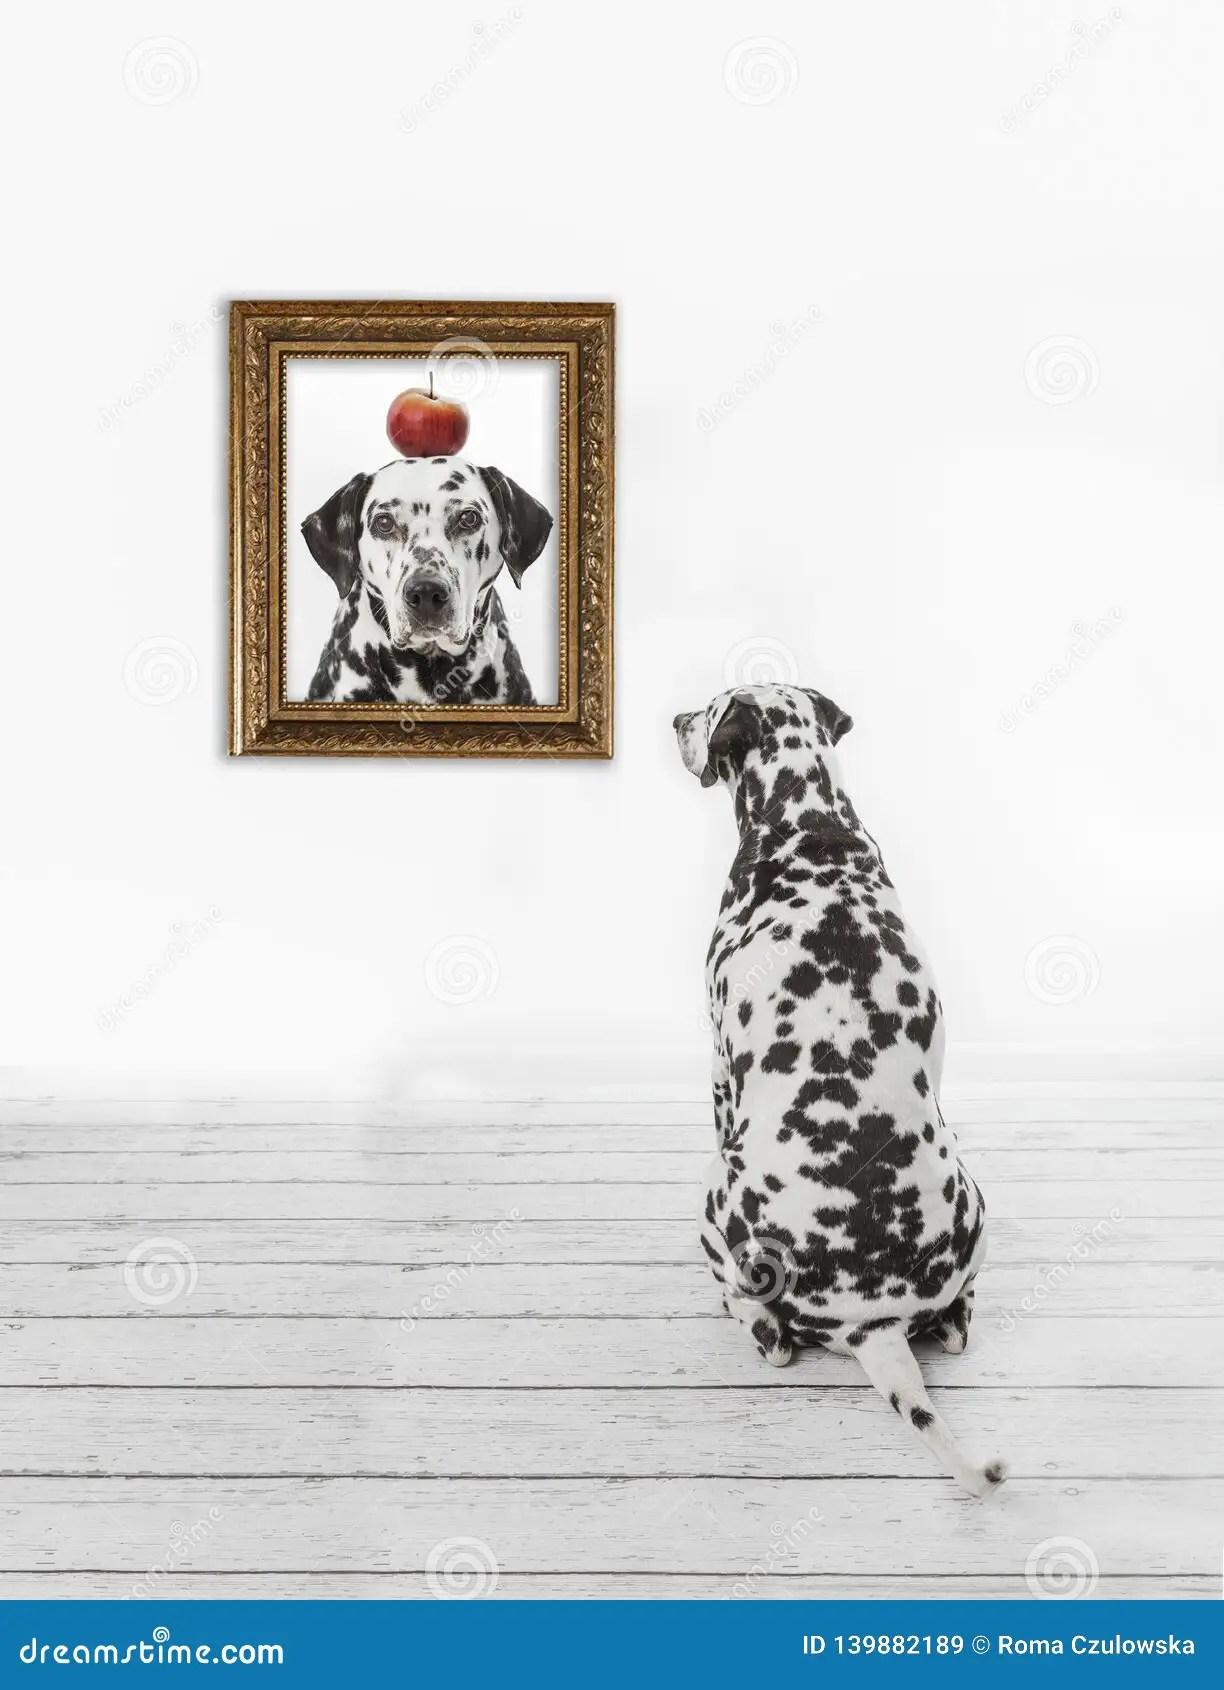 Dalmatian Dog Admiring Self Portrait In Golden Frame On